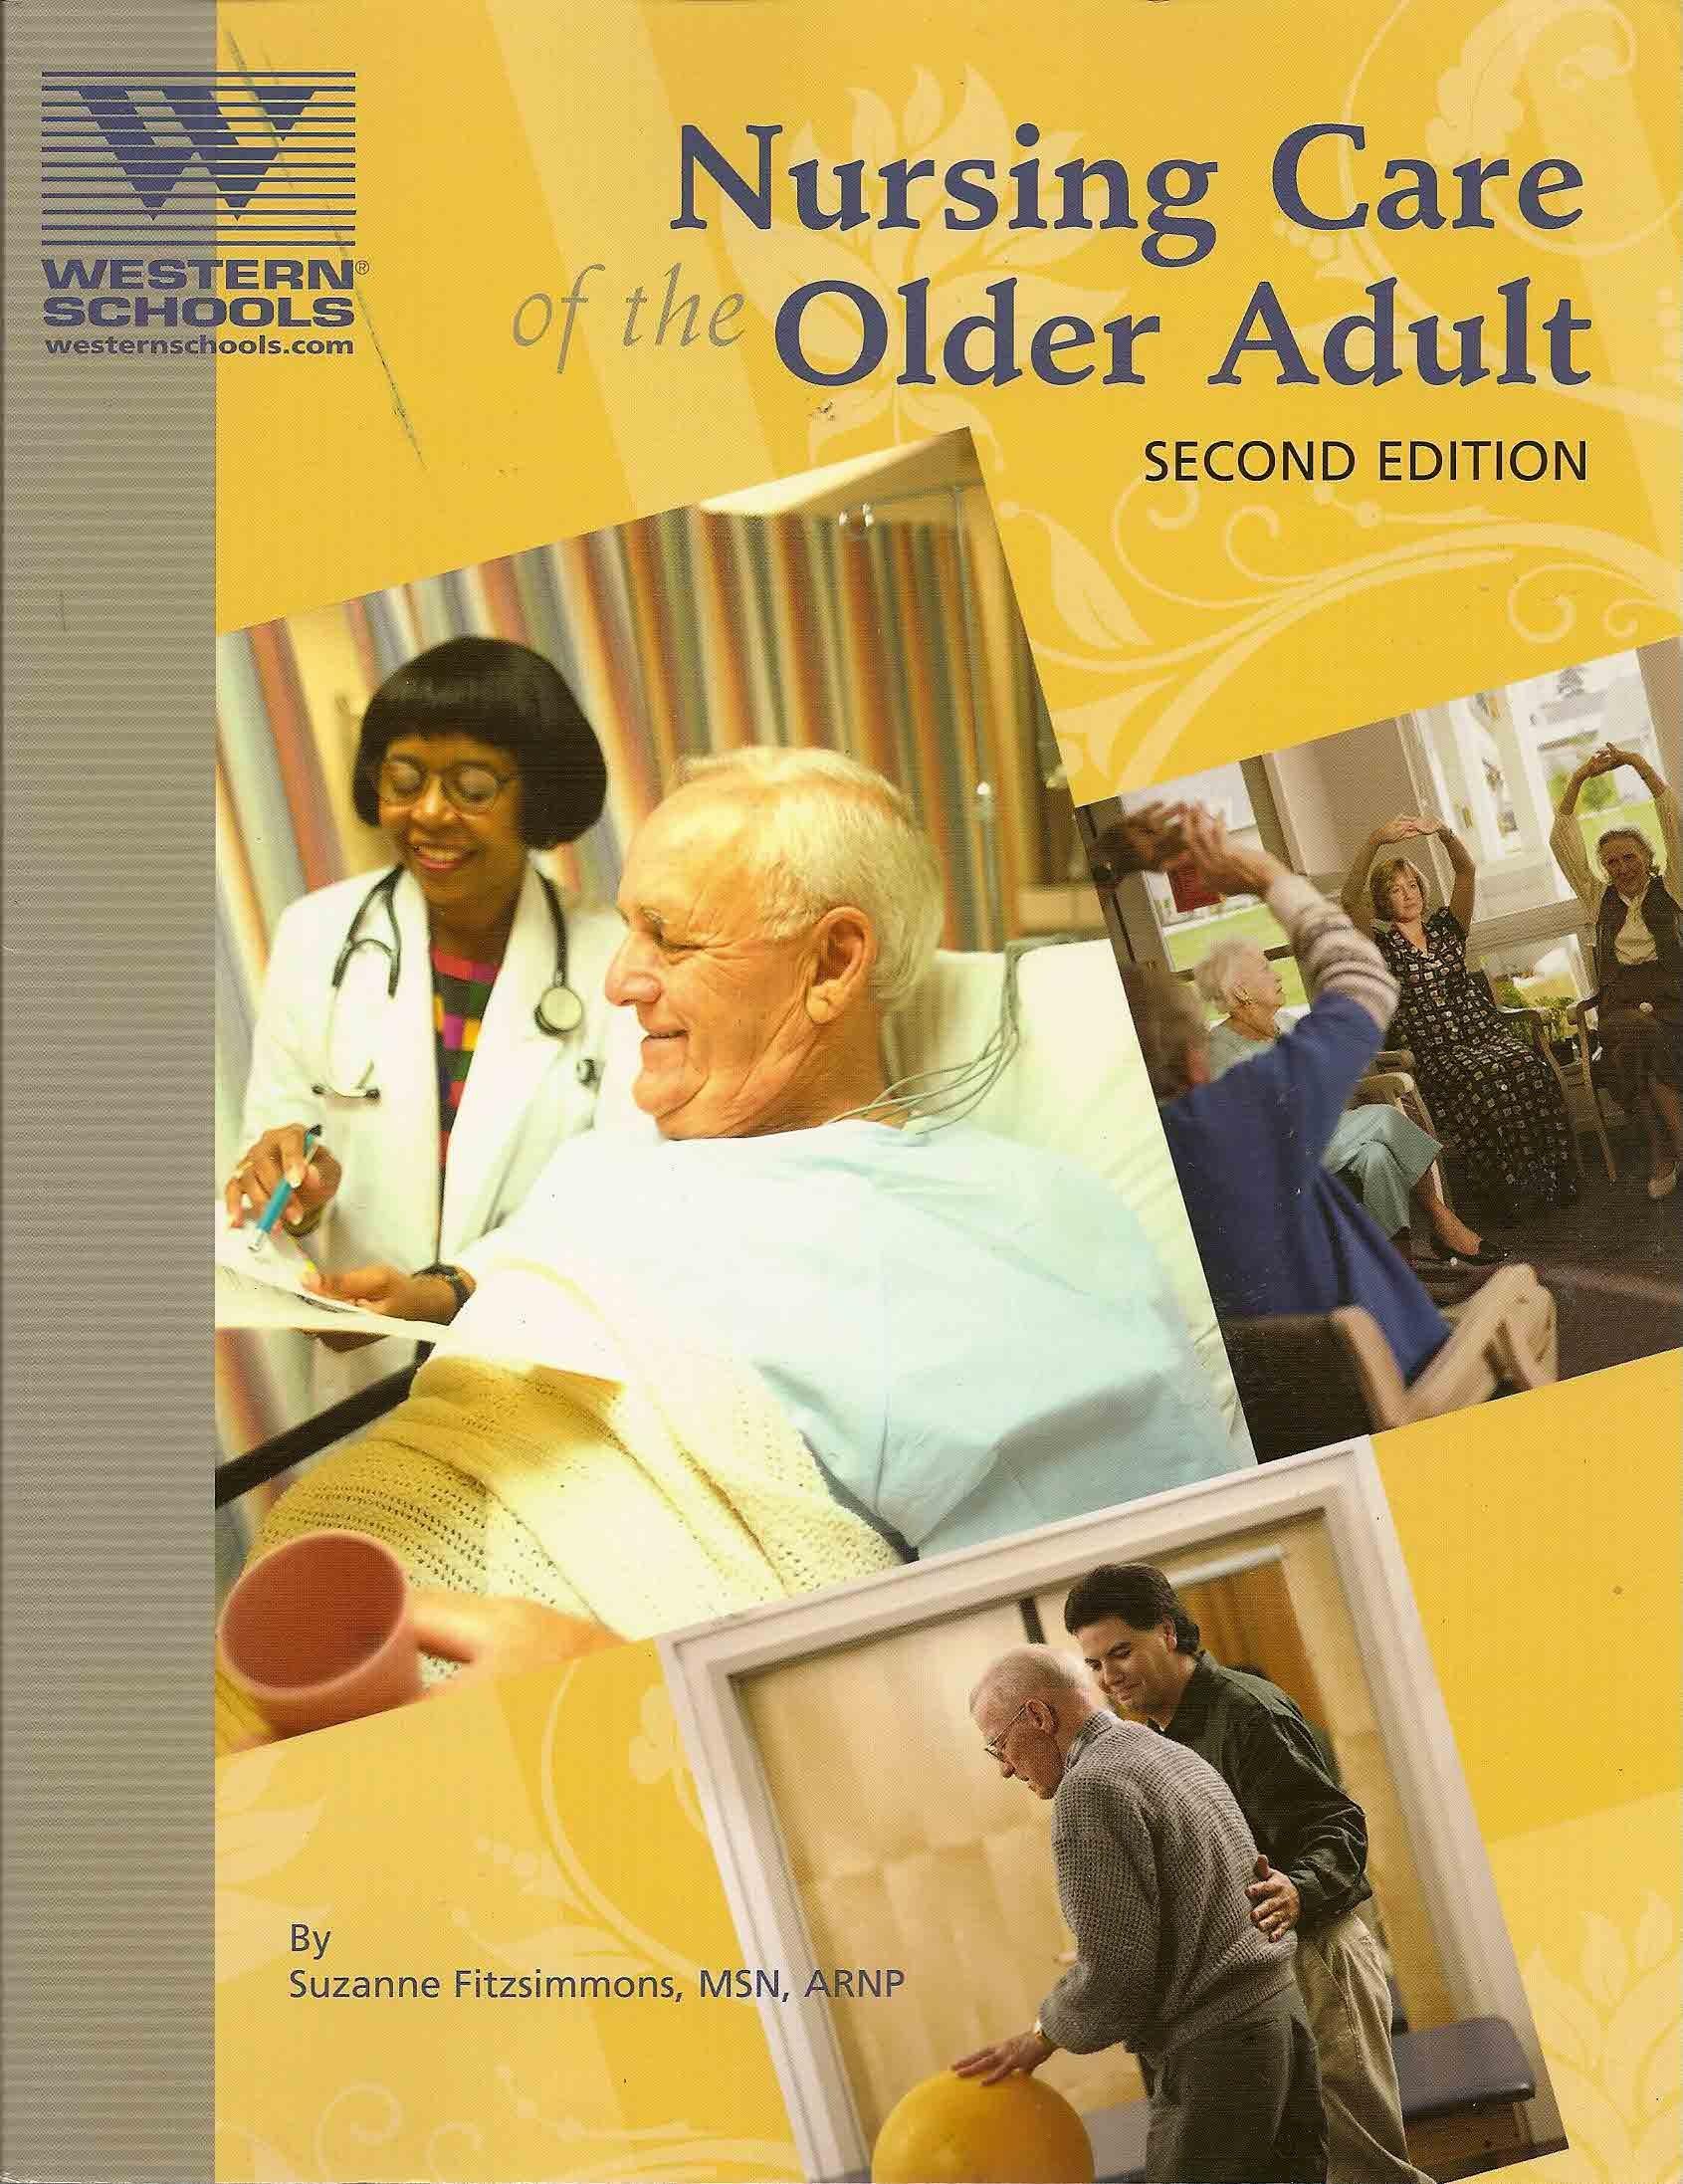 Nursing Care of the Older Adult (Western Schools Edition) ebook